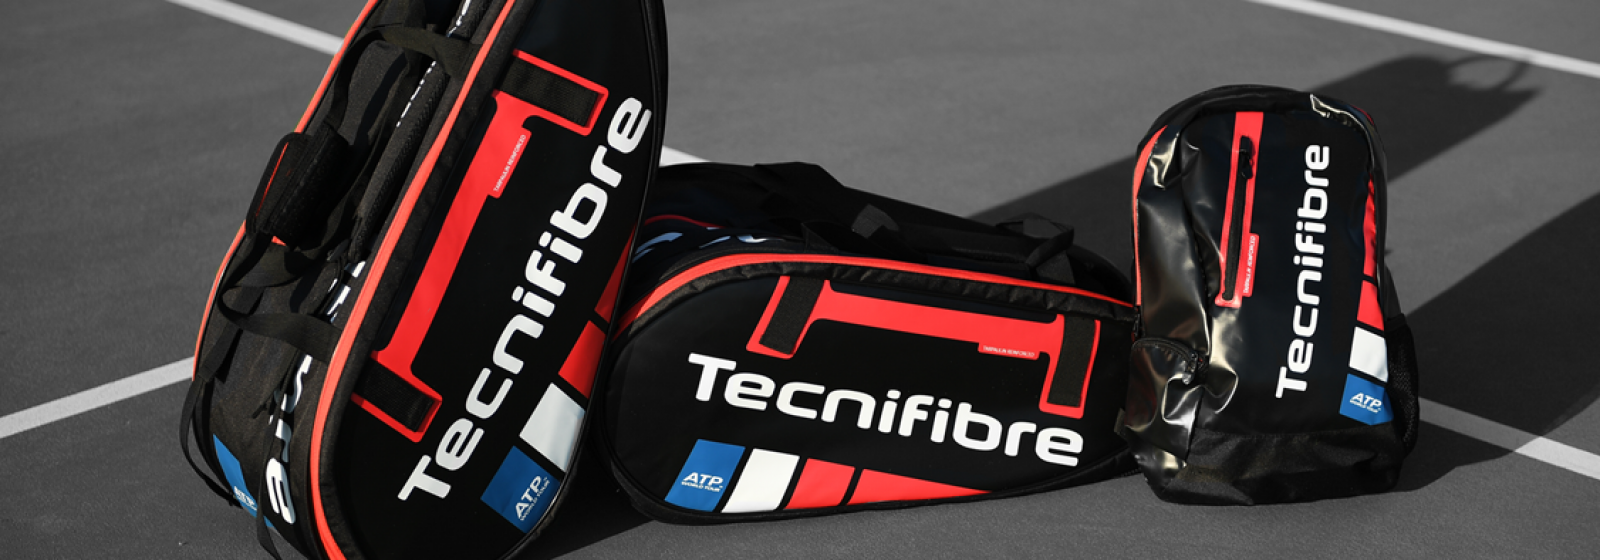 Tecnifibre Sac de tennis Team ATP Endurance 12R GWt1mi2